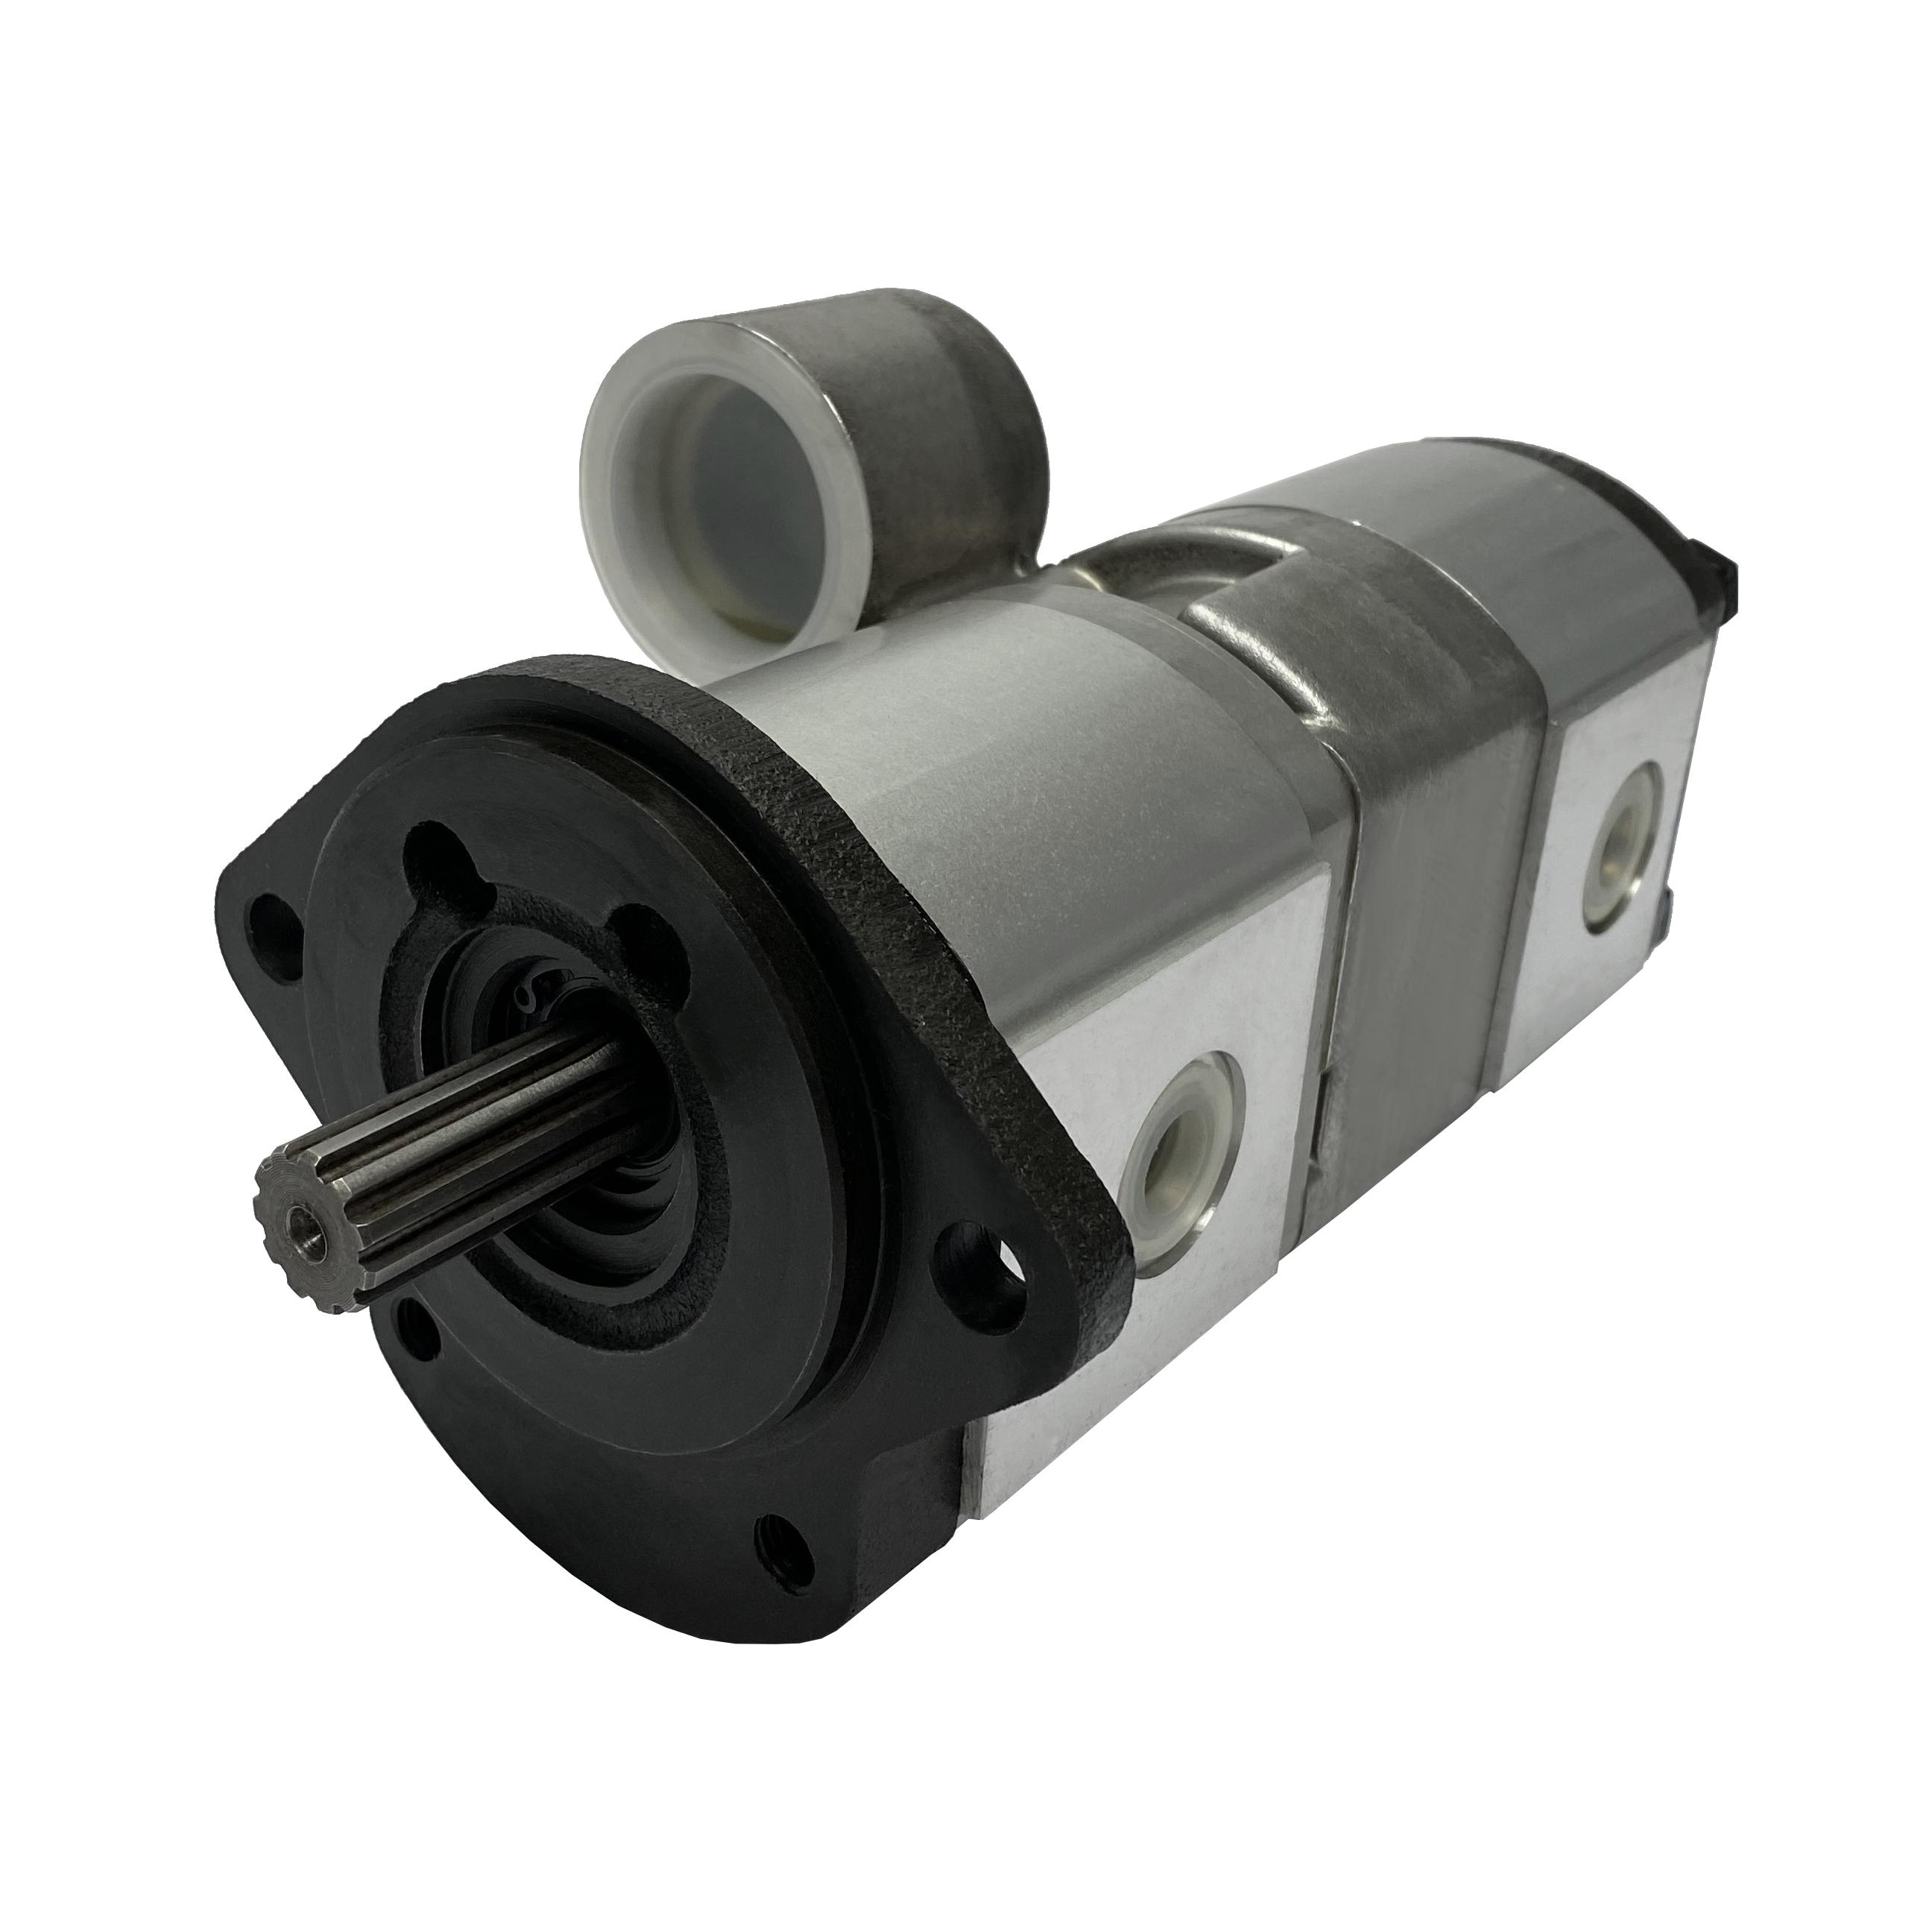 Hydraulic gear pump replacement for Massey Ferguson 3816909M91 | Magister Hydraulics